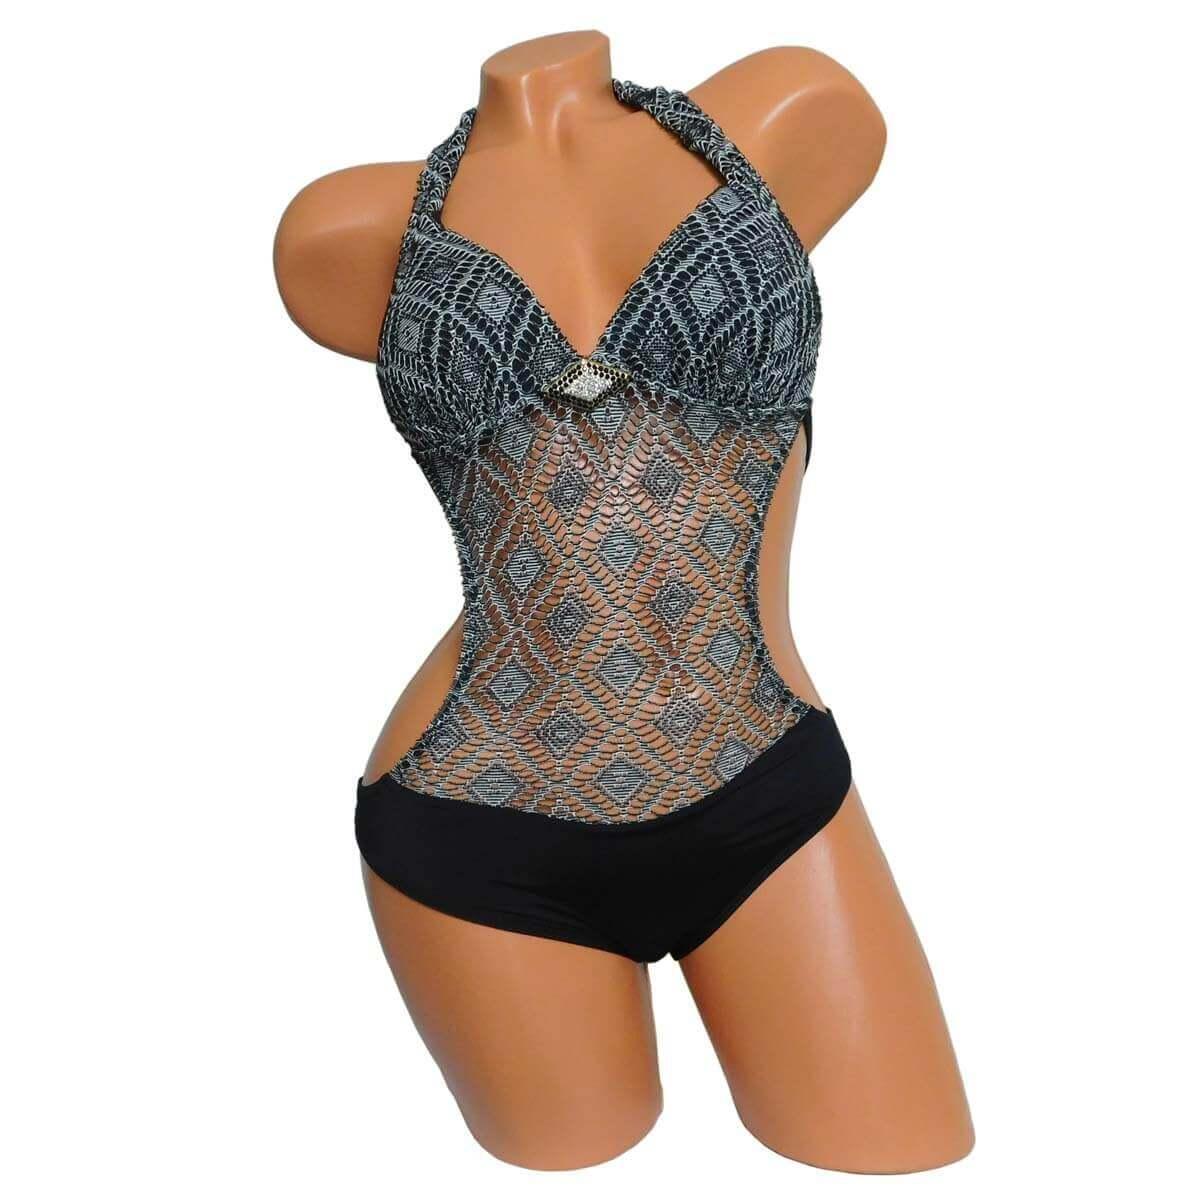 a701a29ead Fekete push up trikini, monokini 5299